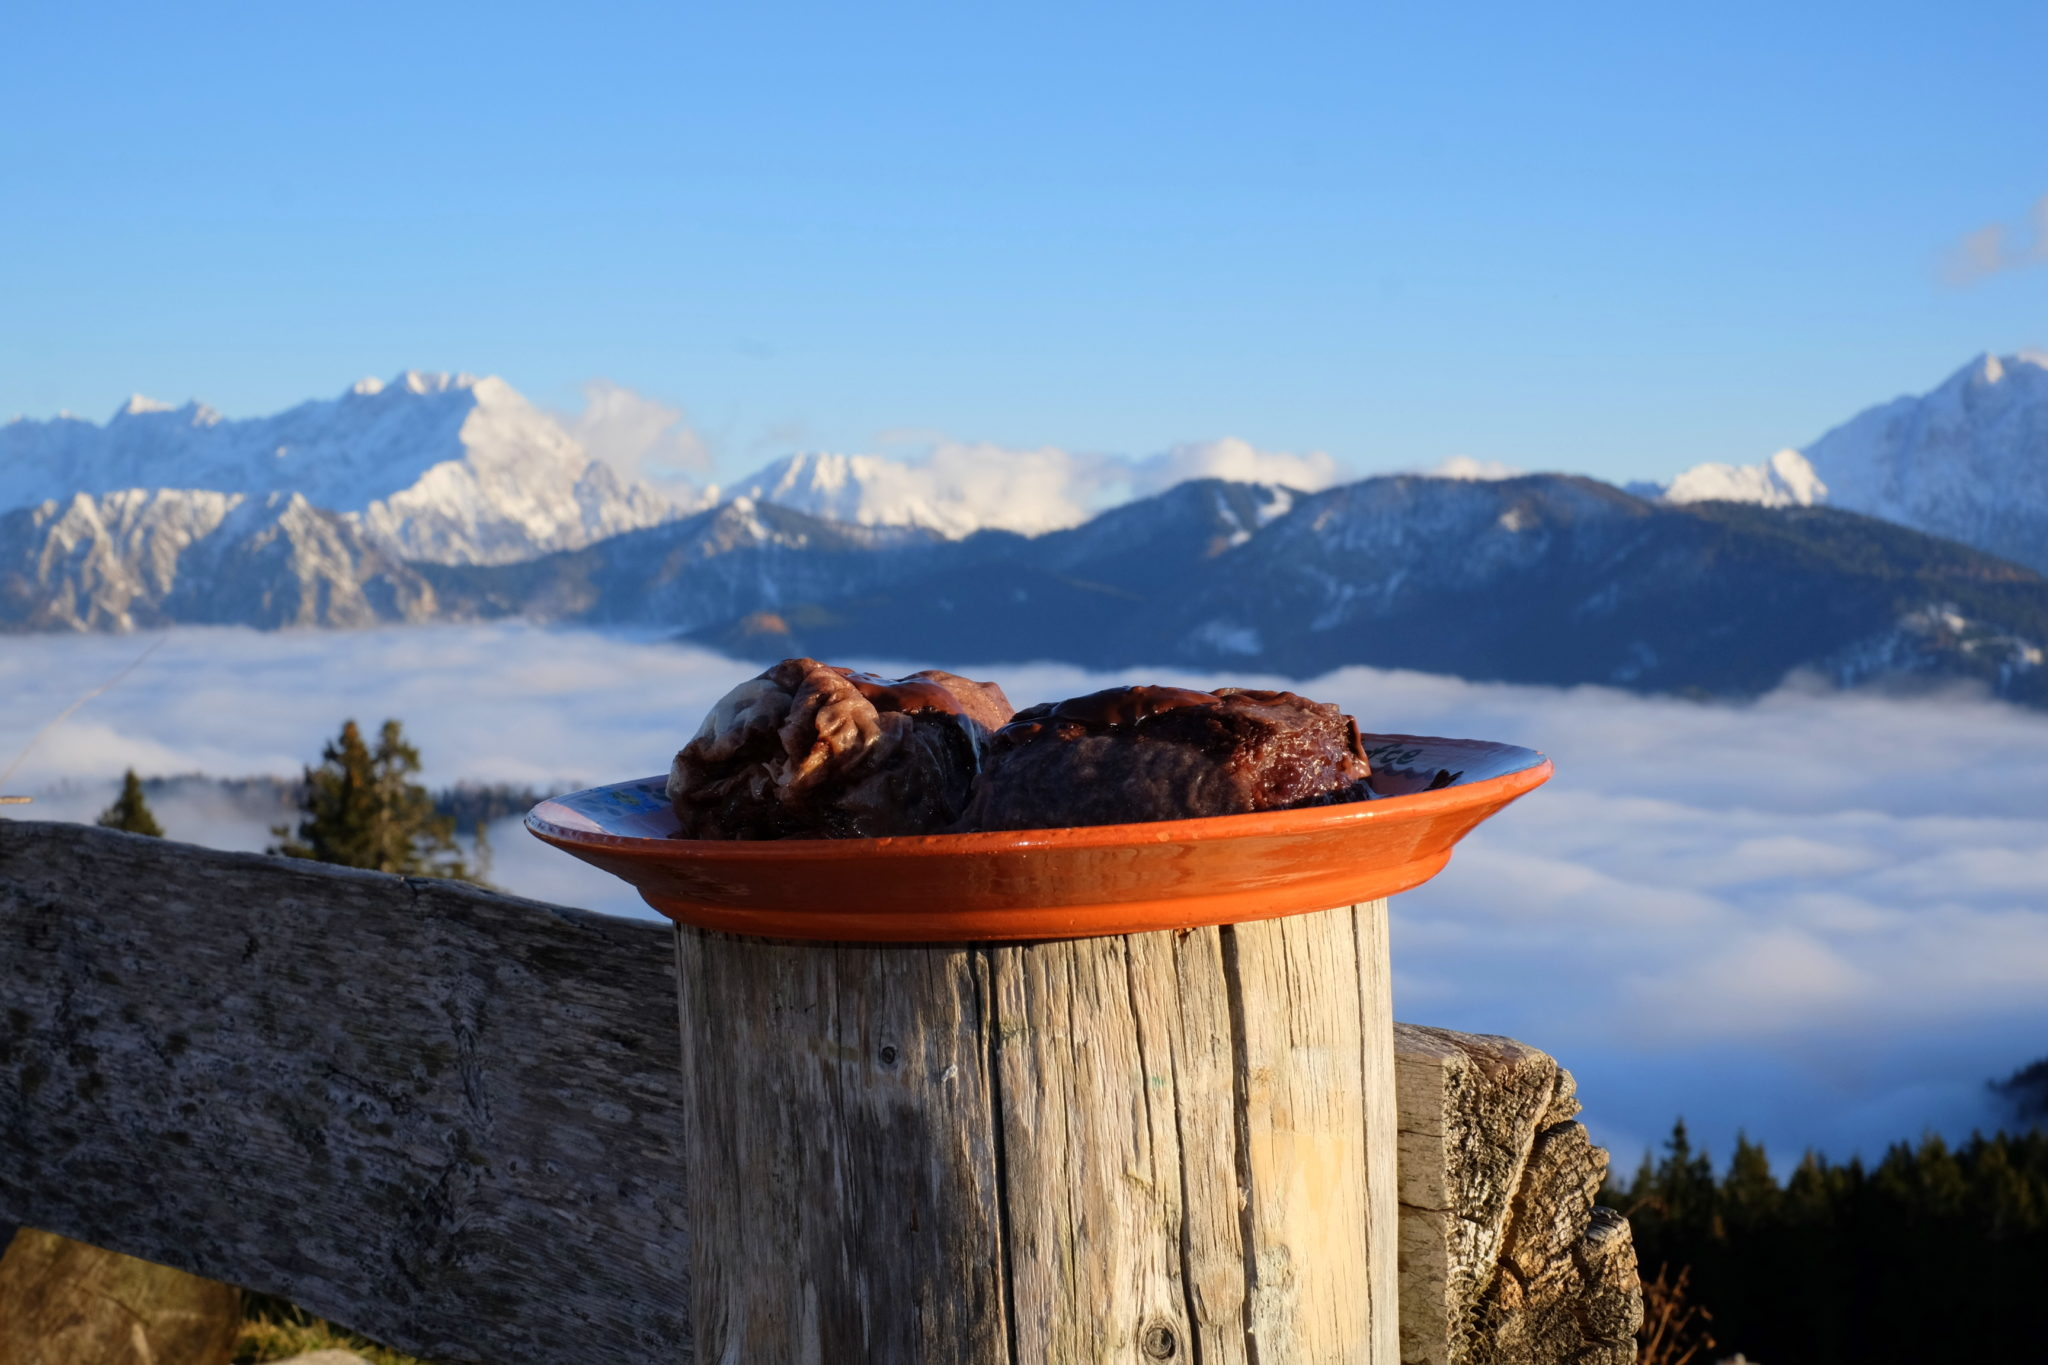 Chocolate štruklji on Kofce, in the mountains, Slovenia